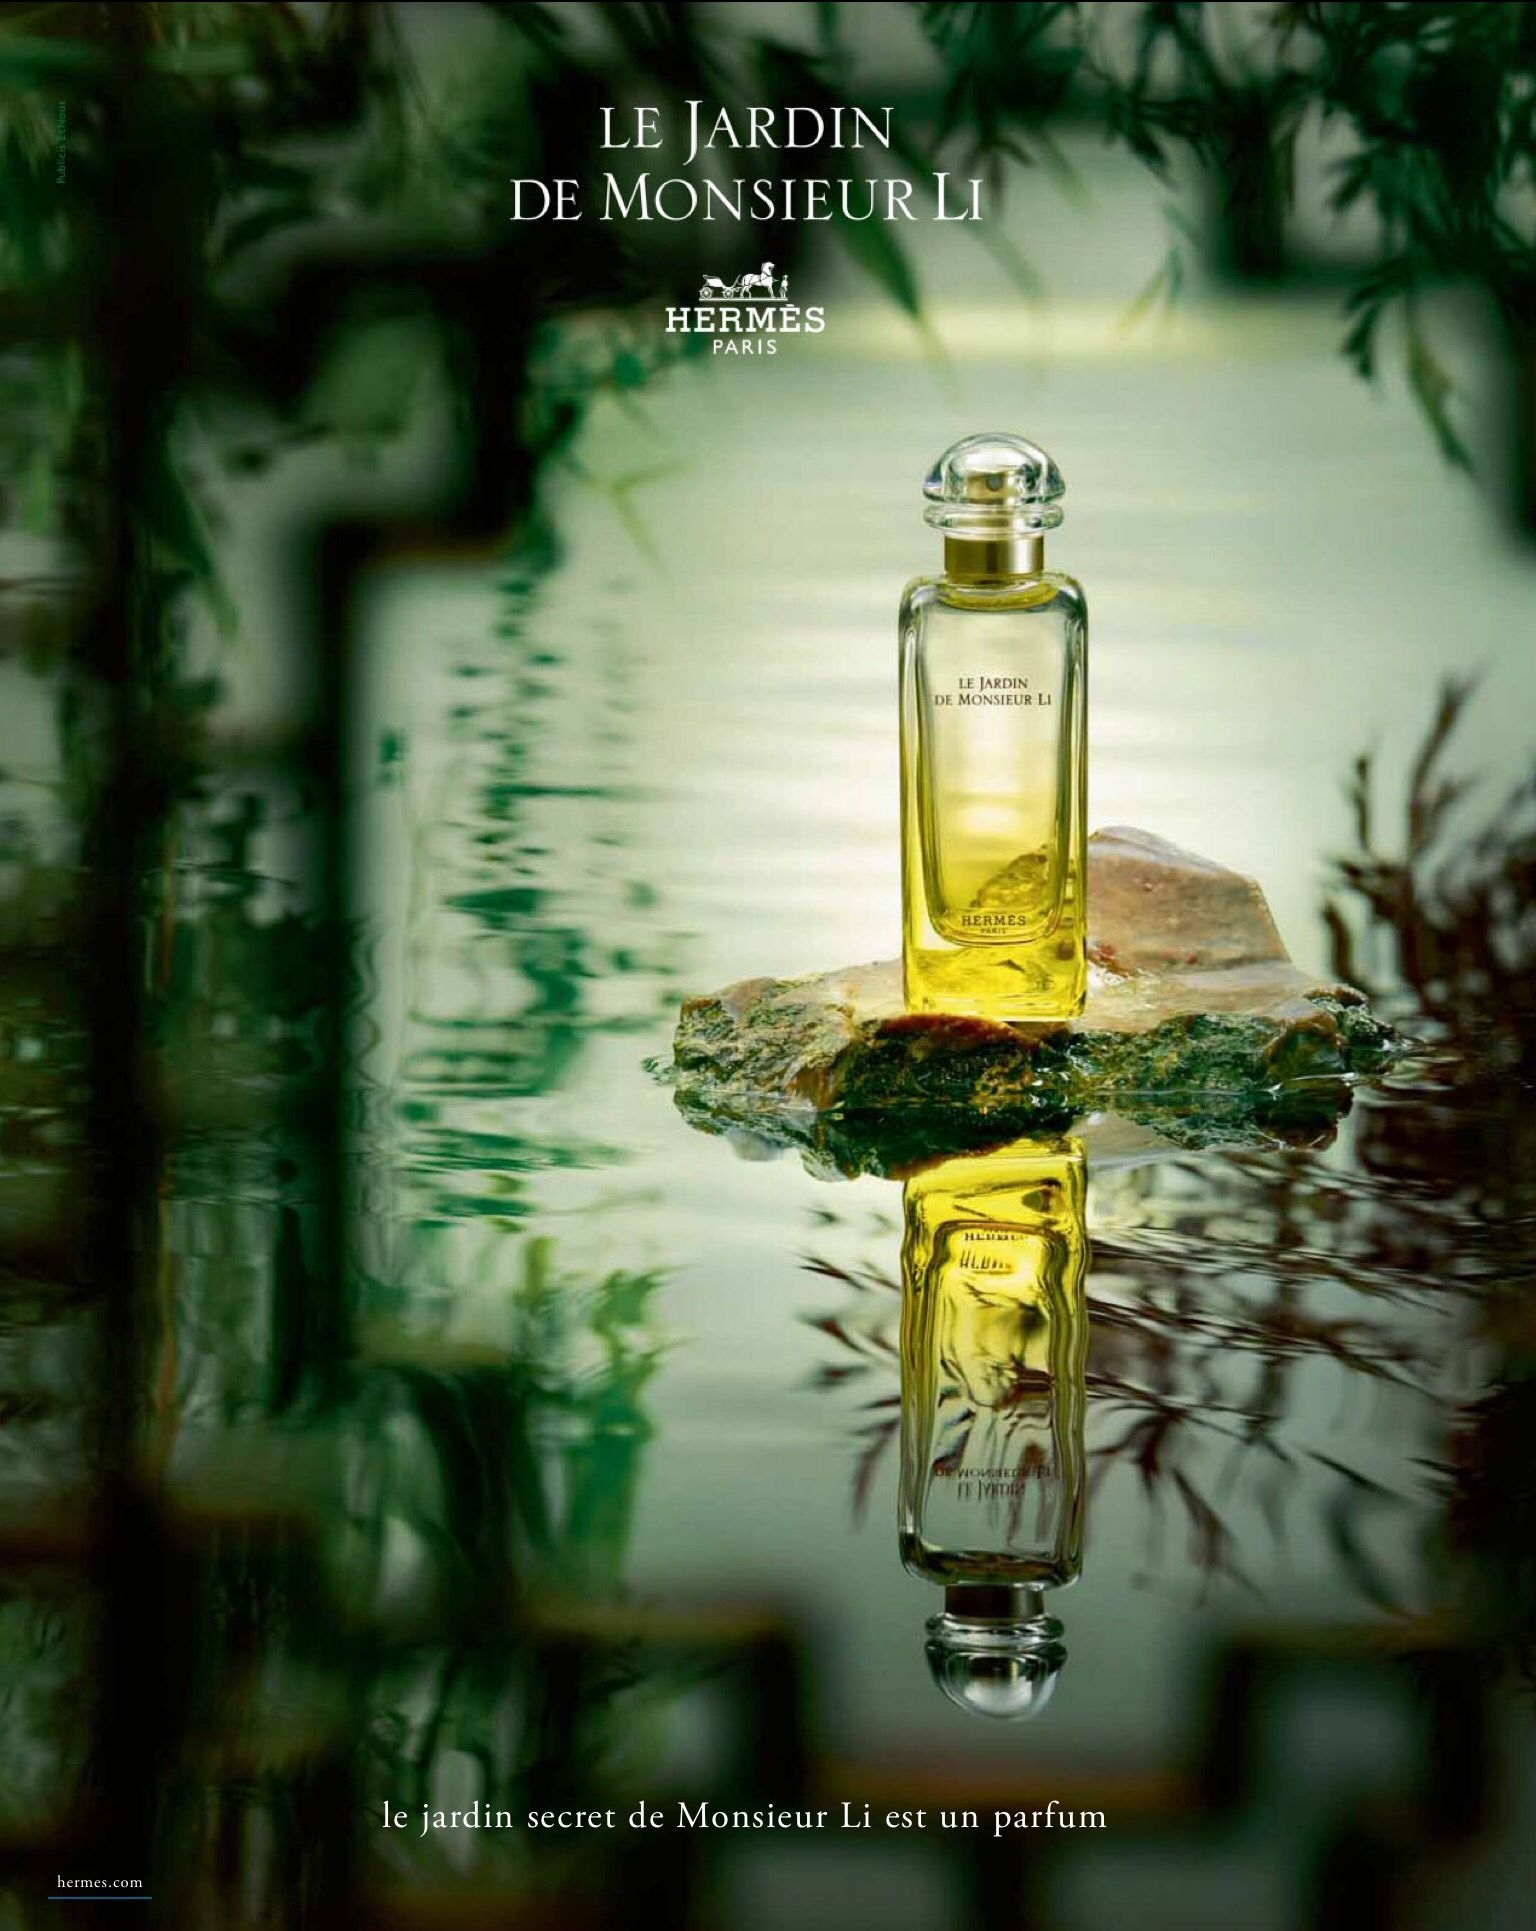 Hermes fragrance le jardin de monsieur li advertising - Hermes un jardin en mediterranee body lotion ...